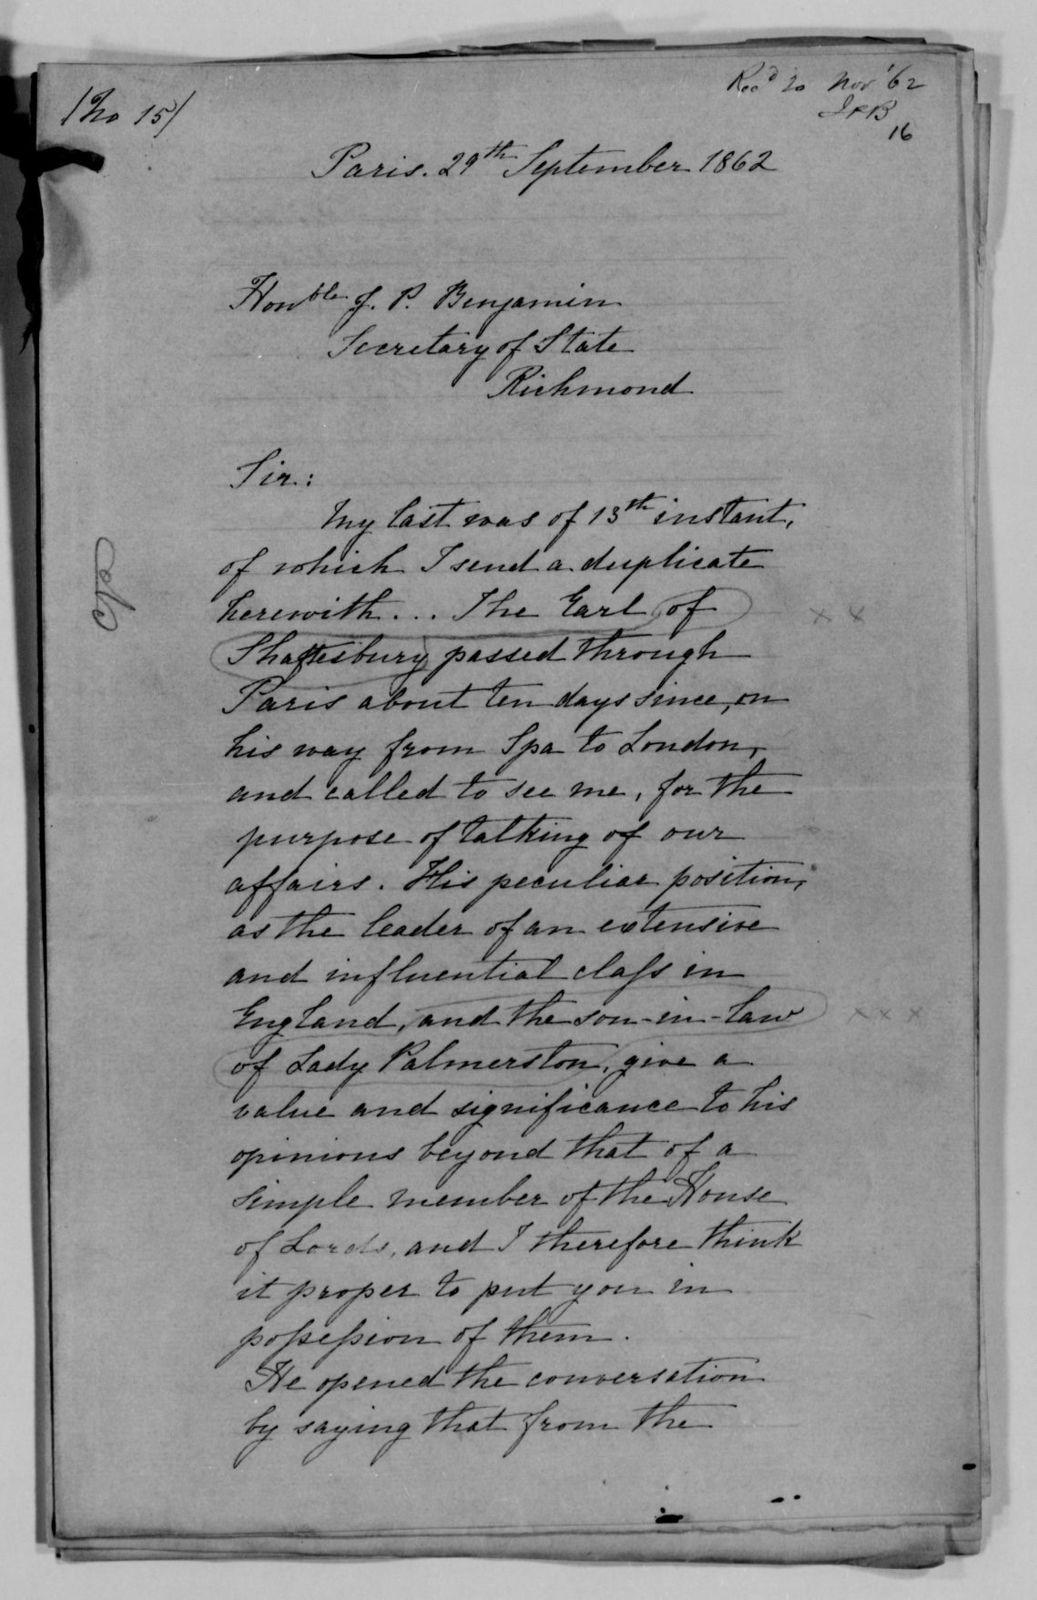 Confederate States of America records: Microfilm Reel 3